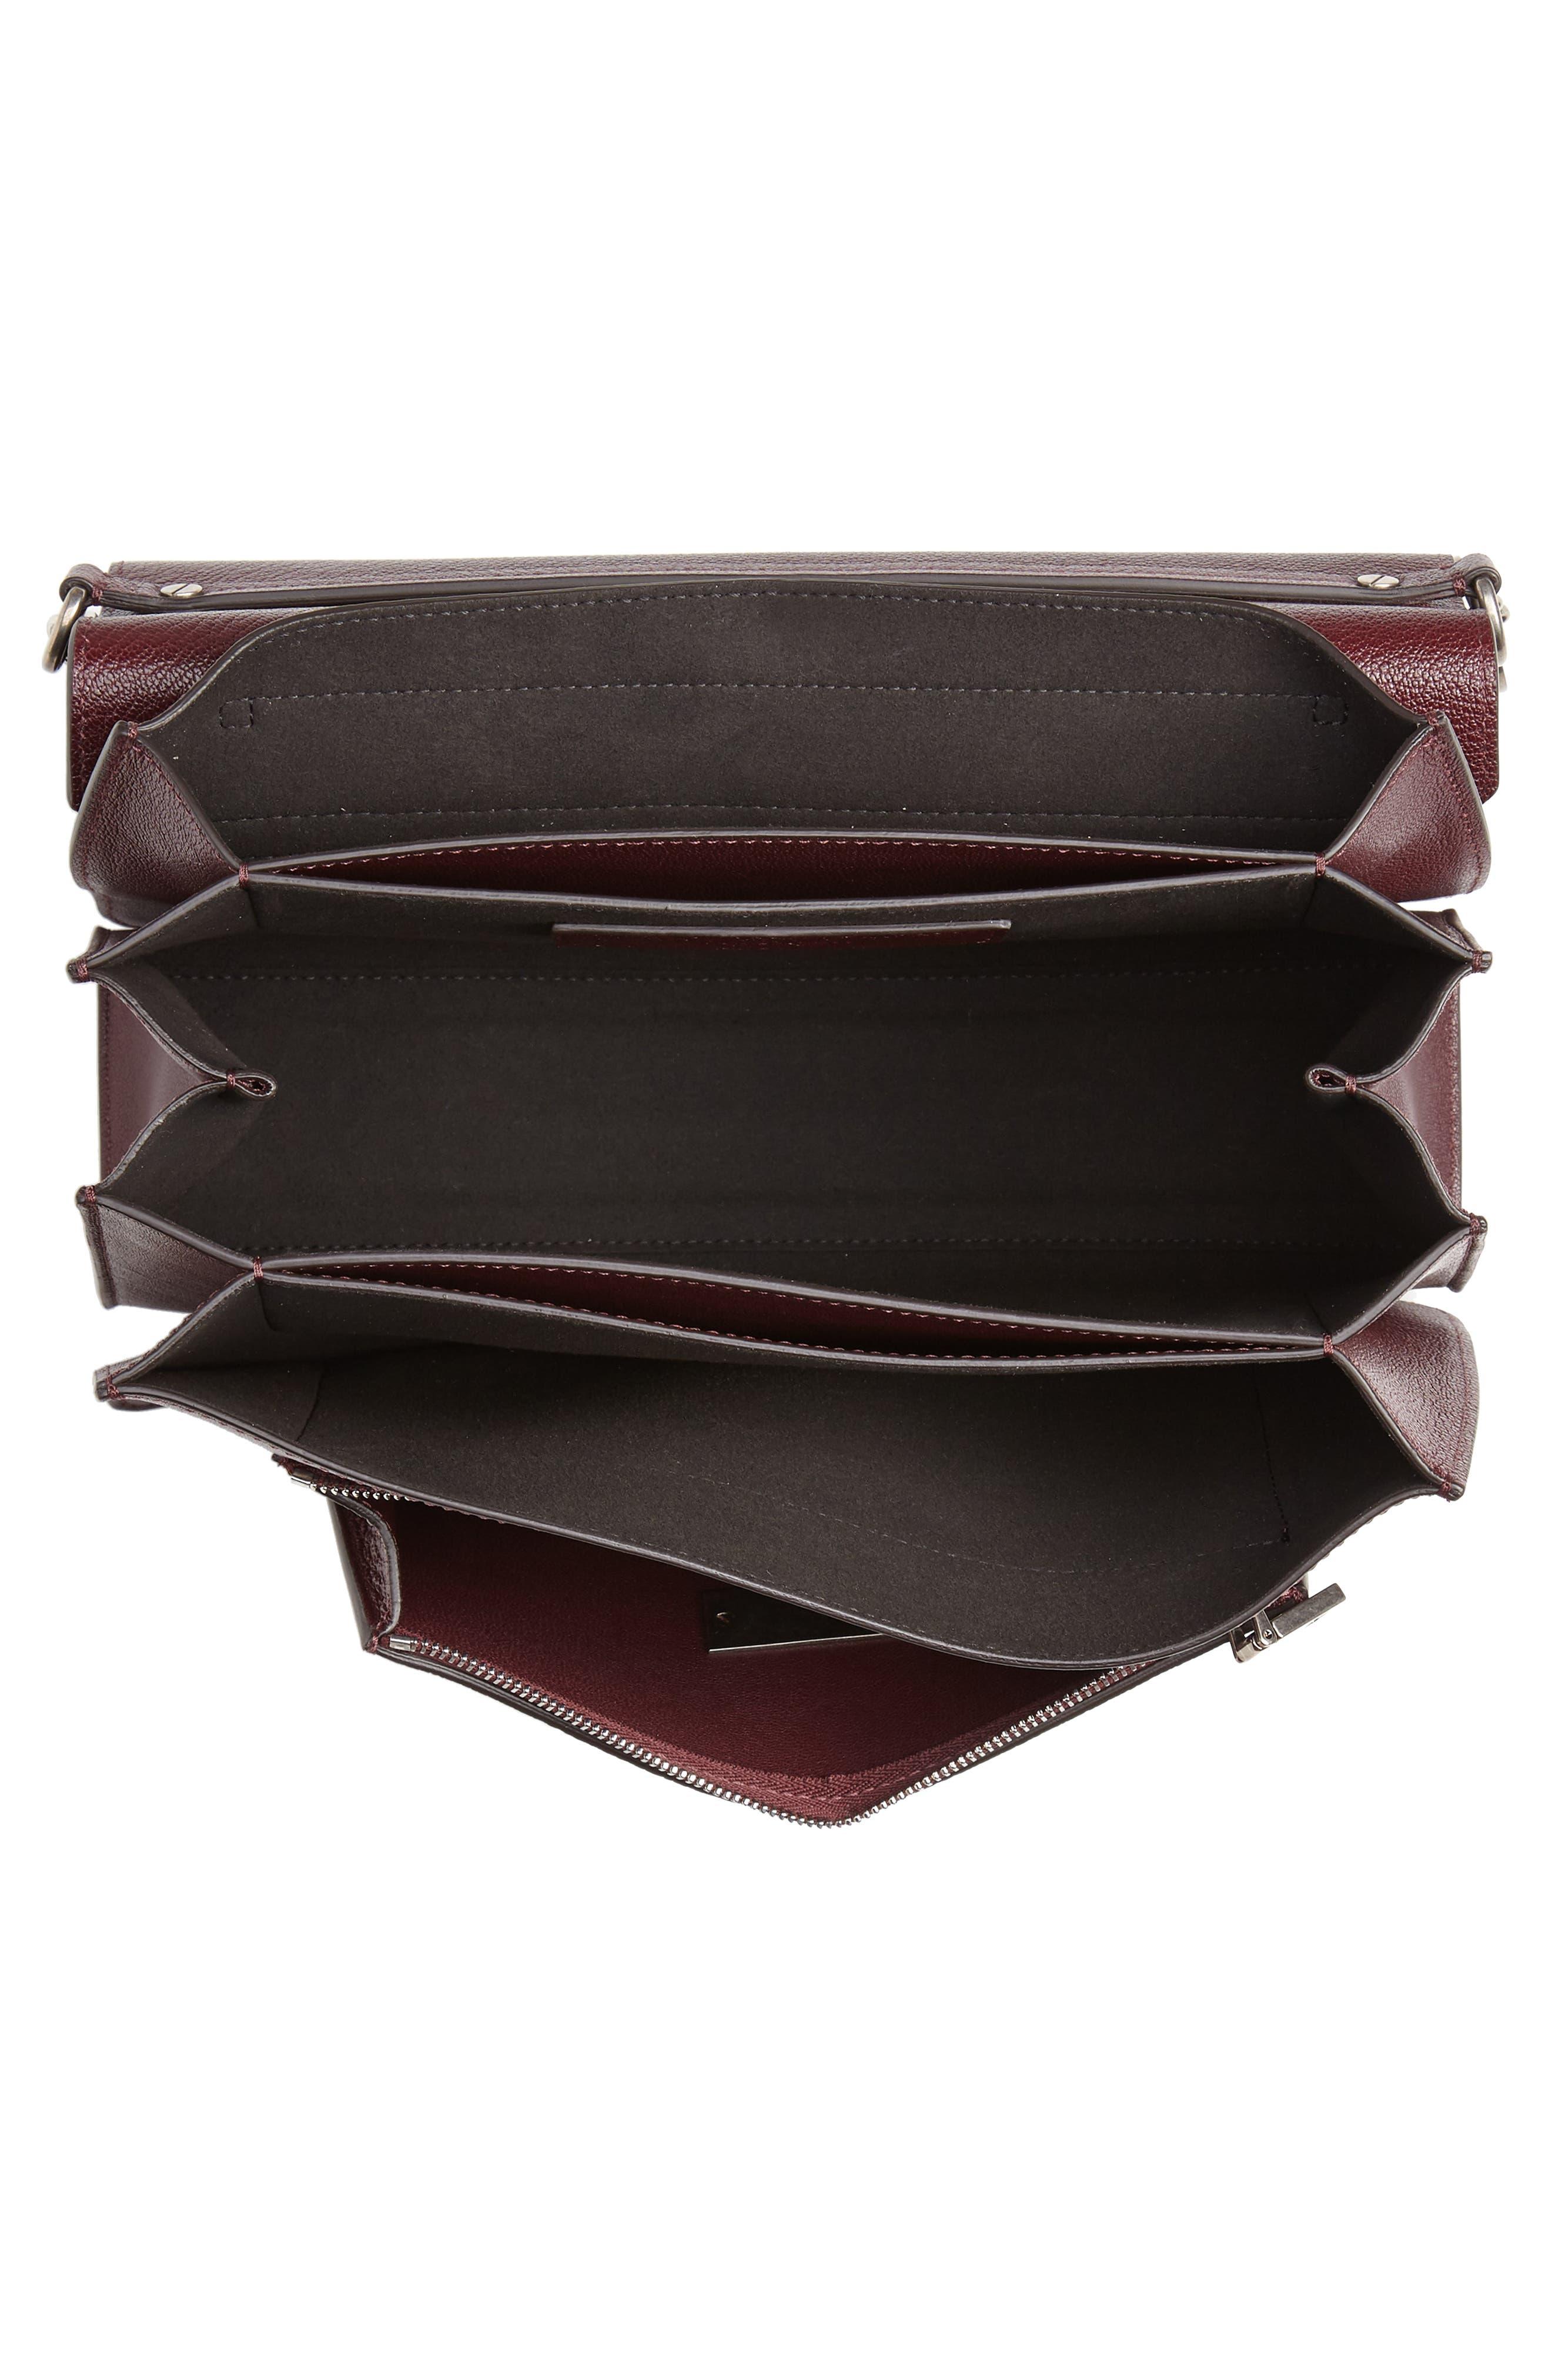 GV3 Goatskin Leather Shoulder Bag,                             Alternate thumbnail 4, color,                             AUBERGINE